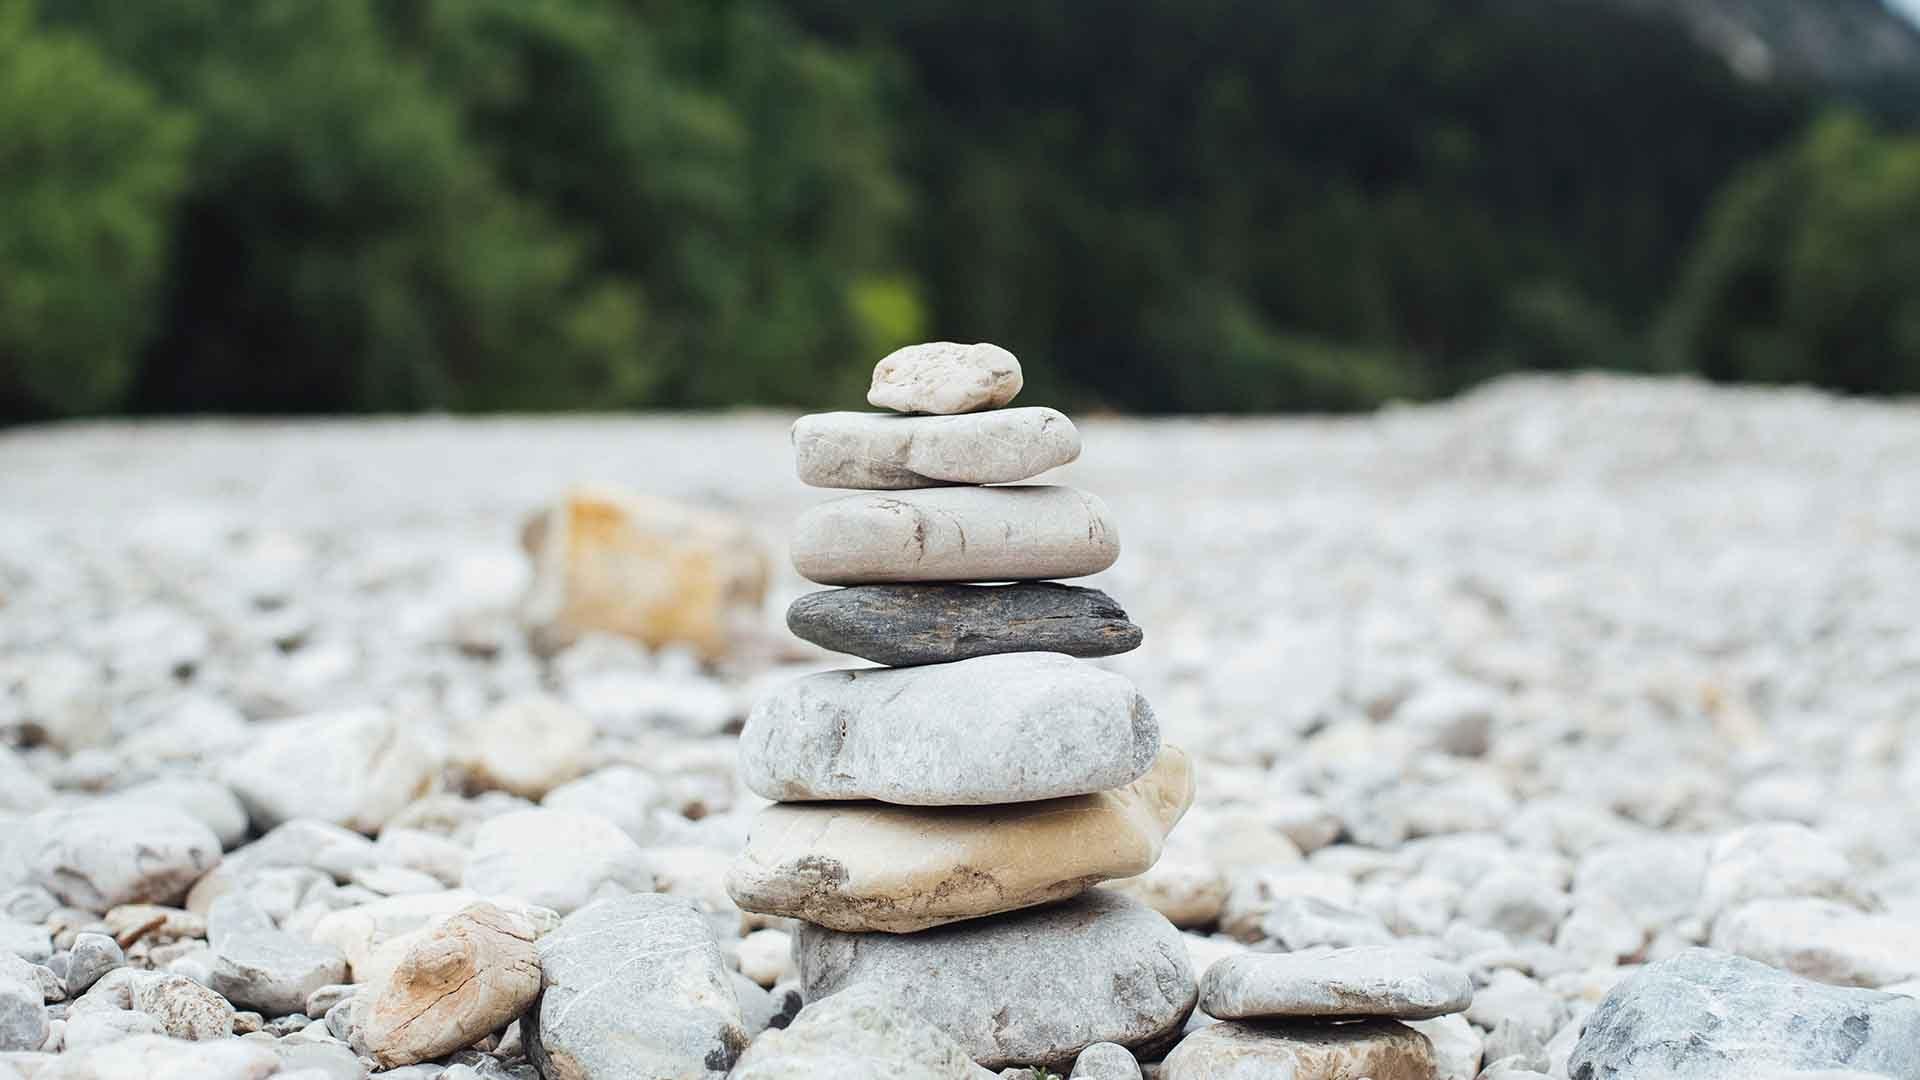 Lauren Chandler on Seeking Stability When Your World Is Shaken